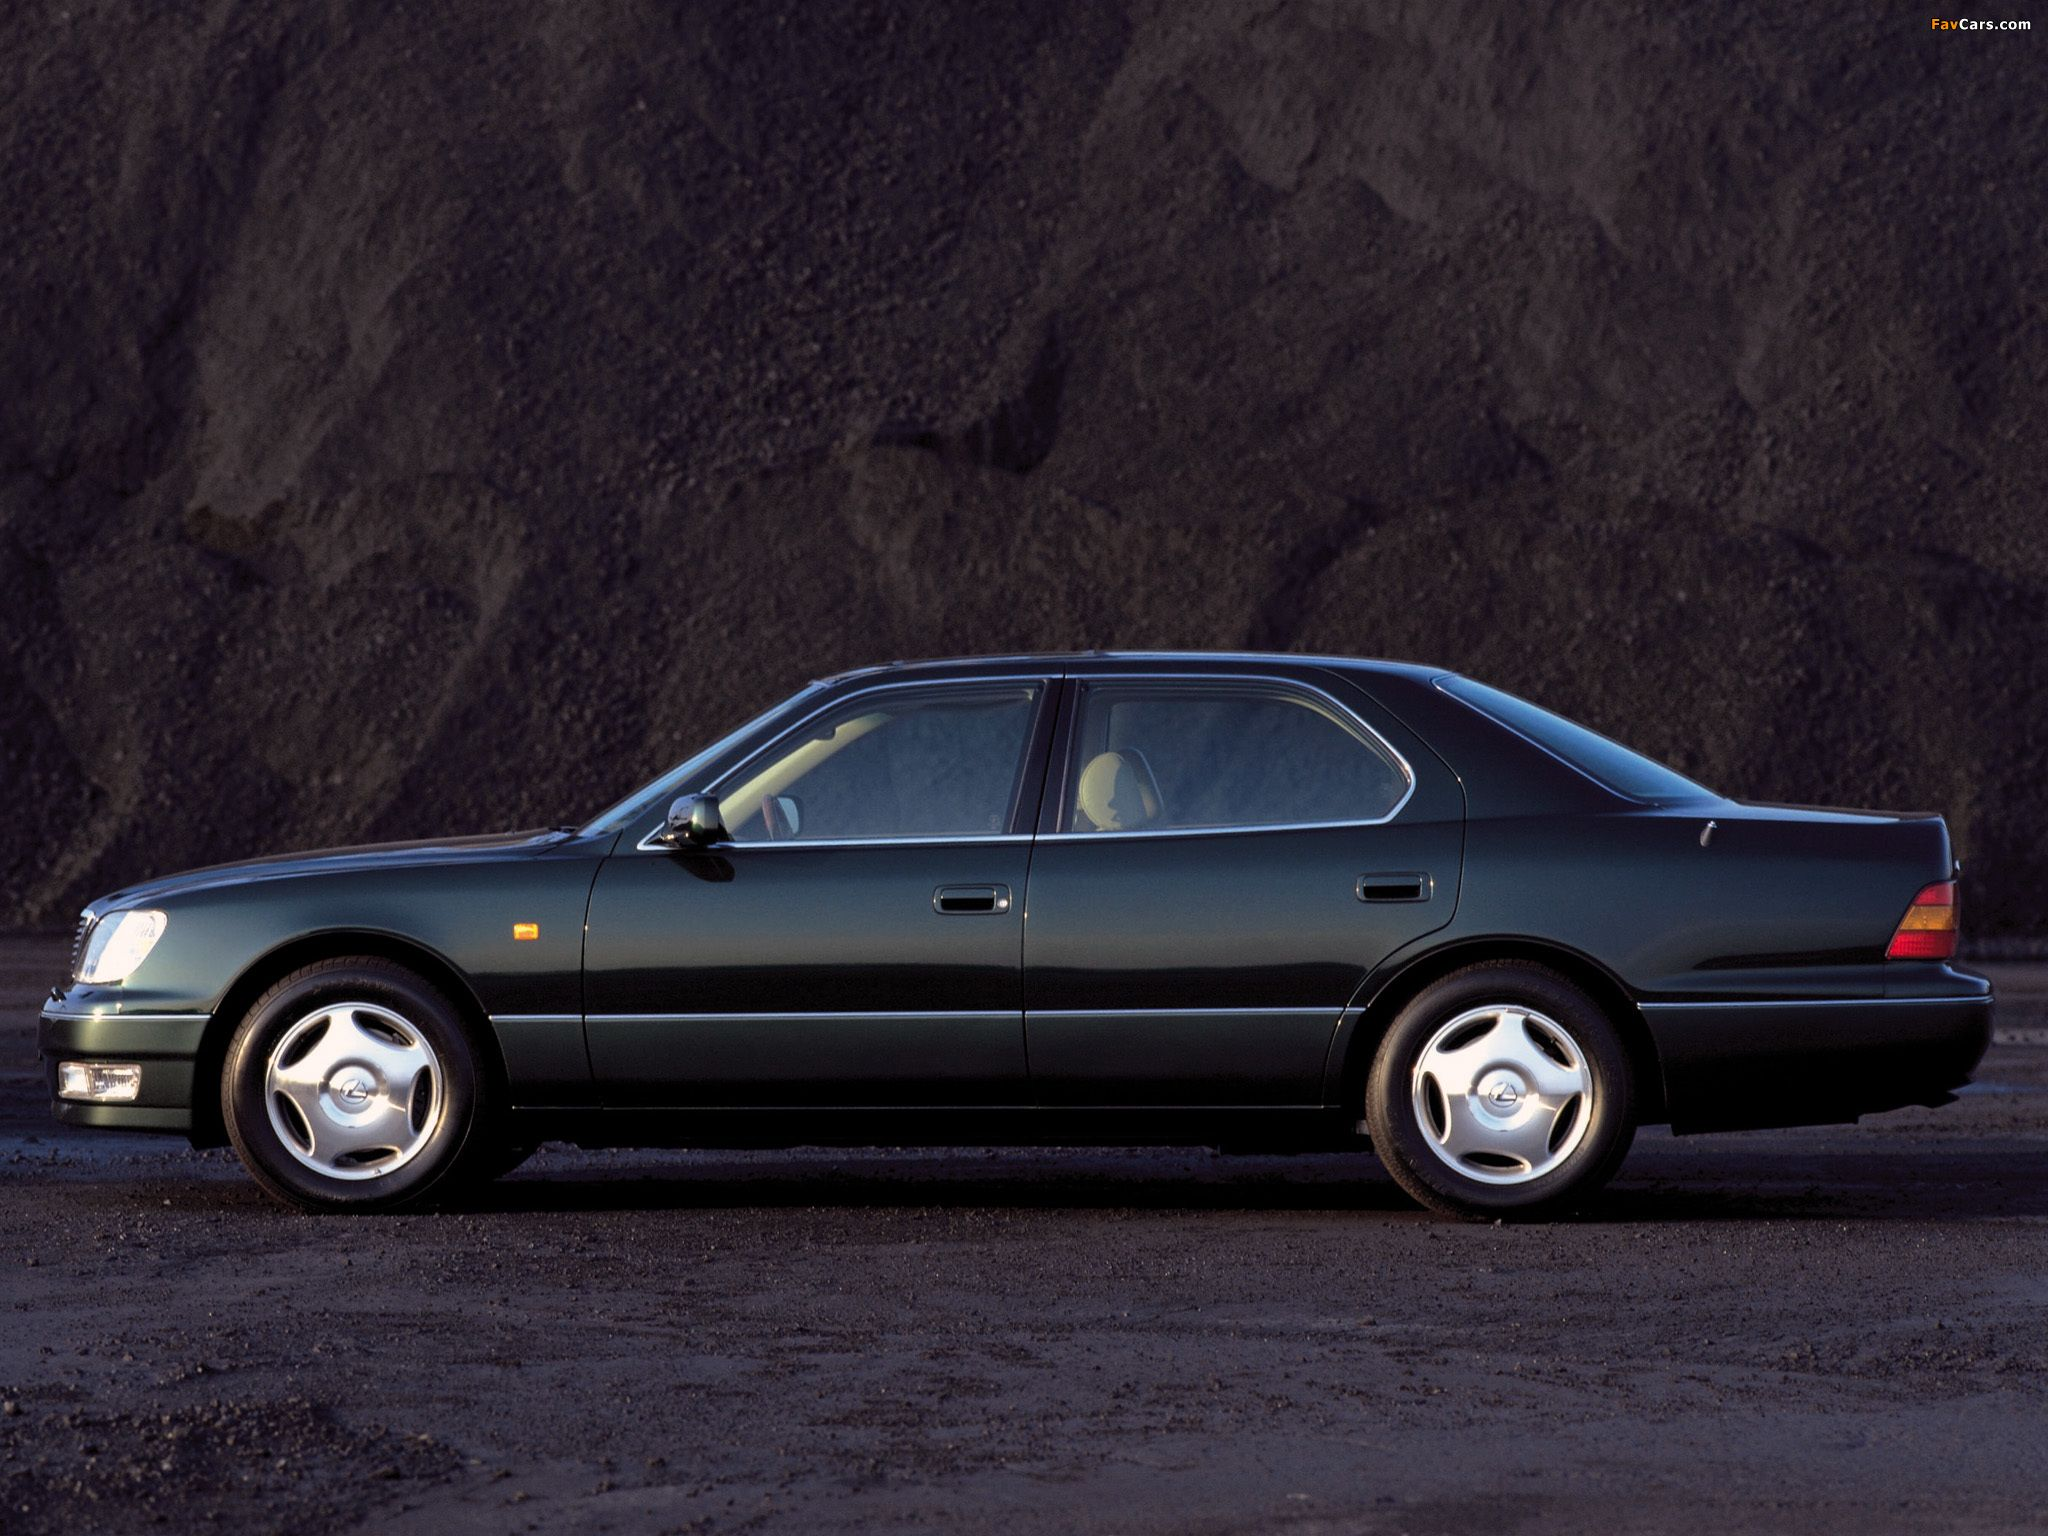 medium resolution of 1997 lexus ls400 lexus gs300 fuel economy japanese cars car photos model